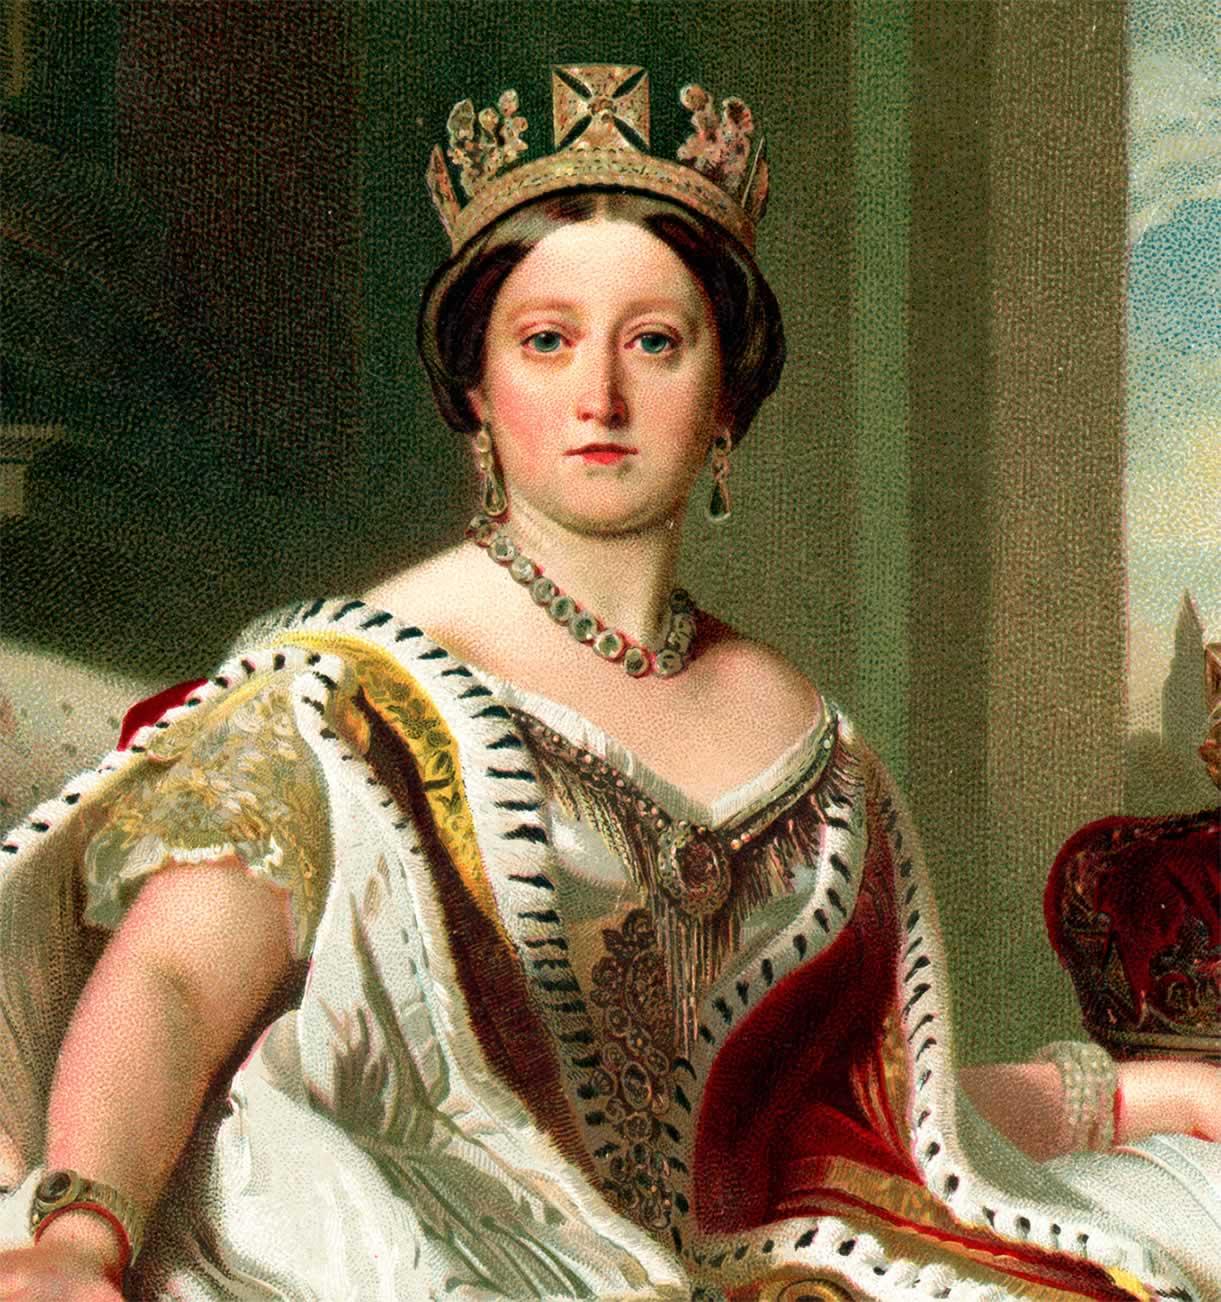 Painting of Queen Victoria.